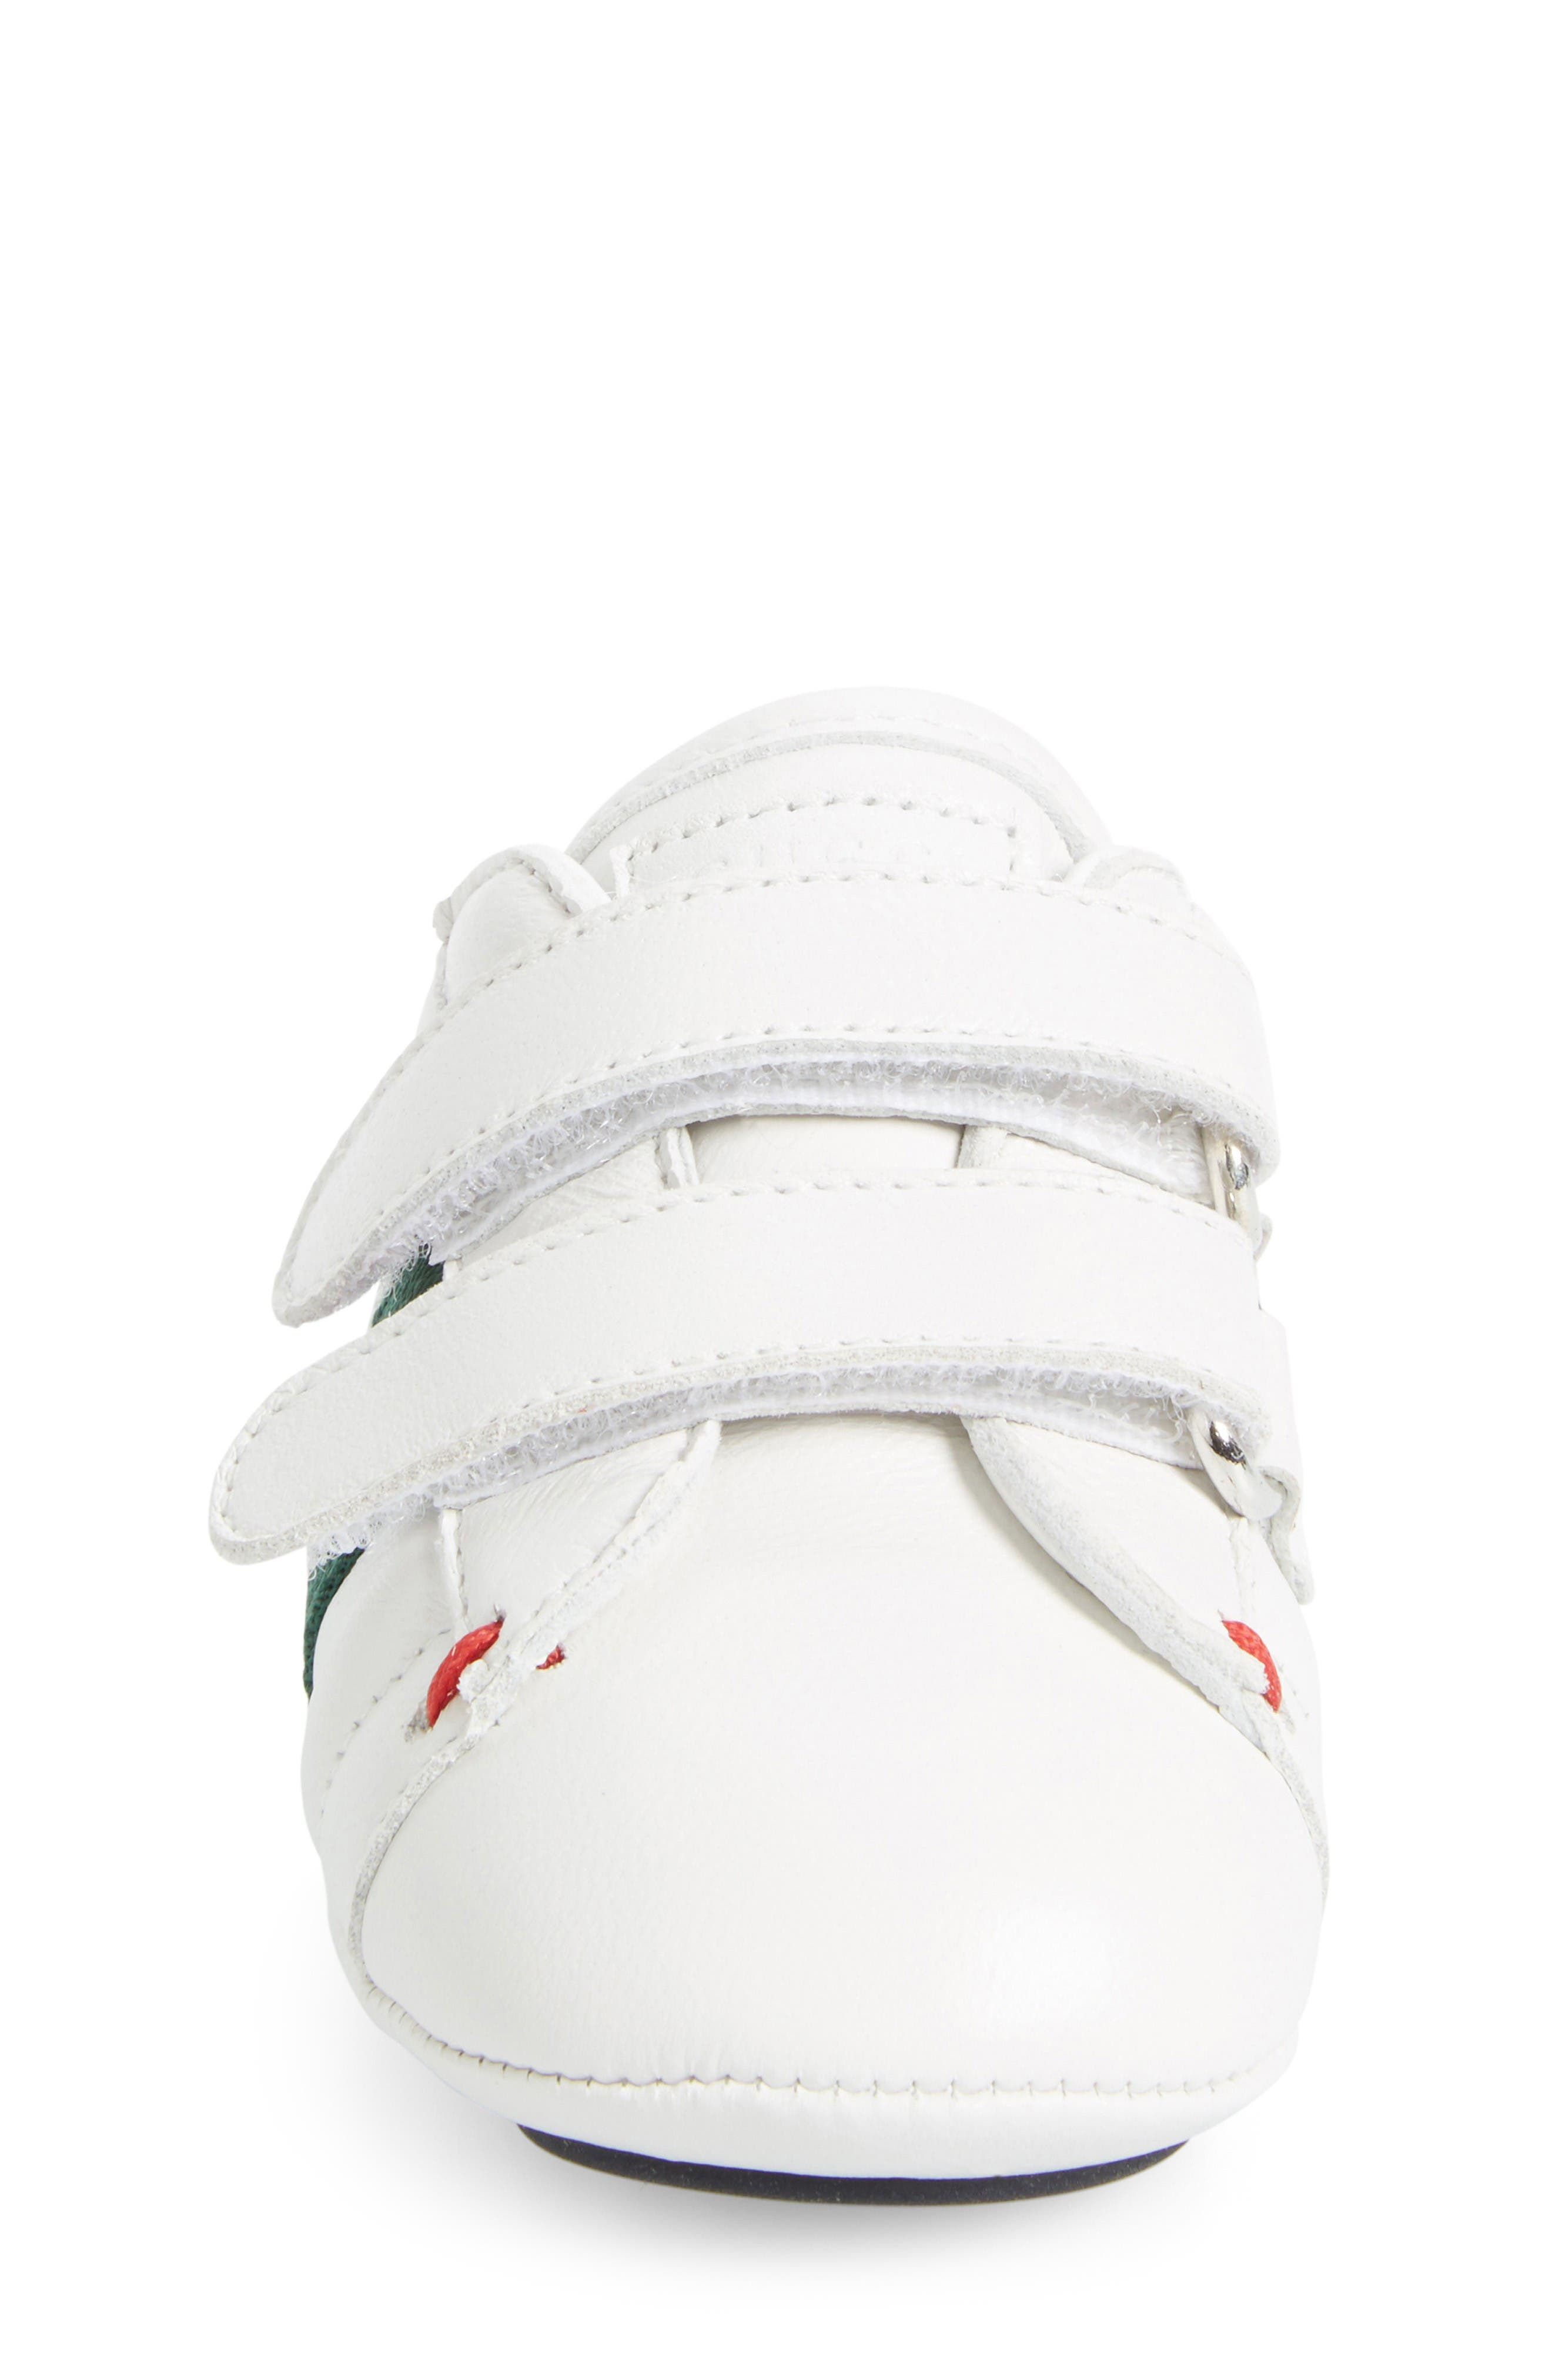 Alternate Image 3  - Gucci 'Ace' Crib Shoe (Baby)